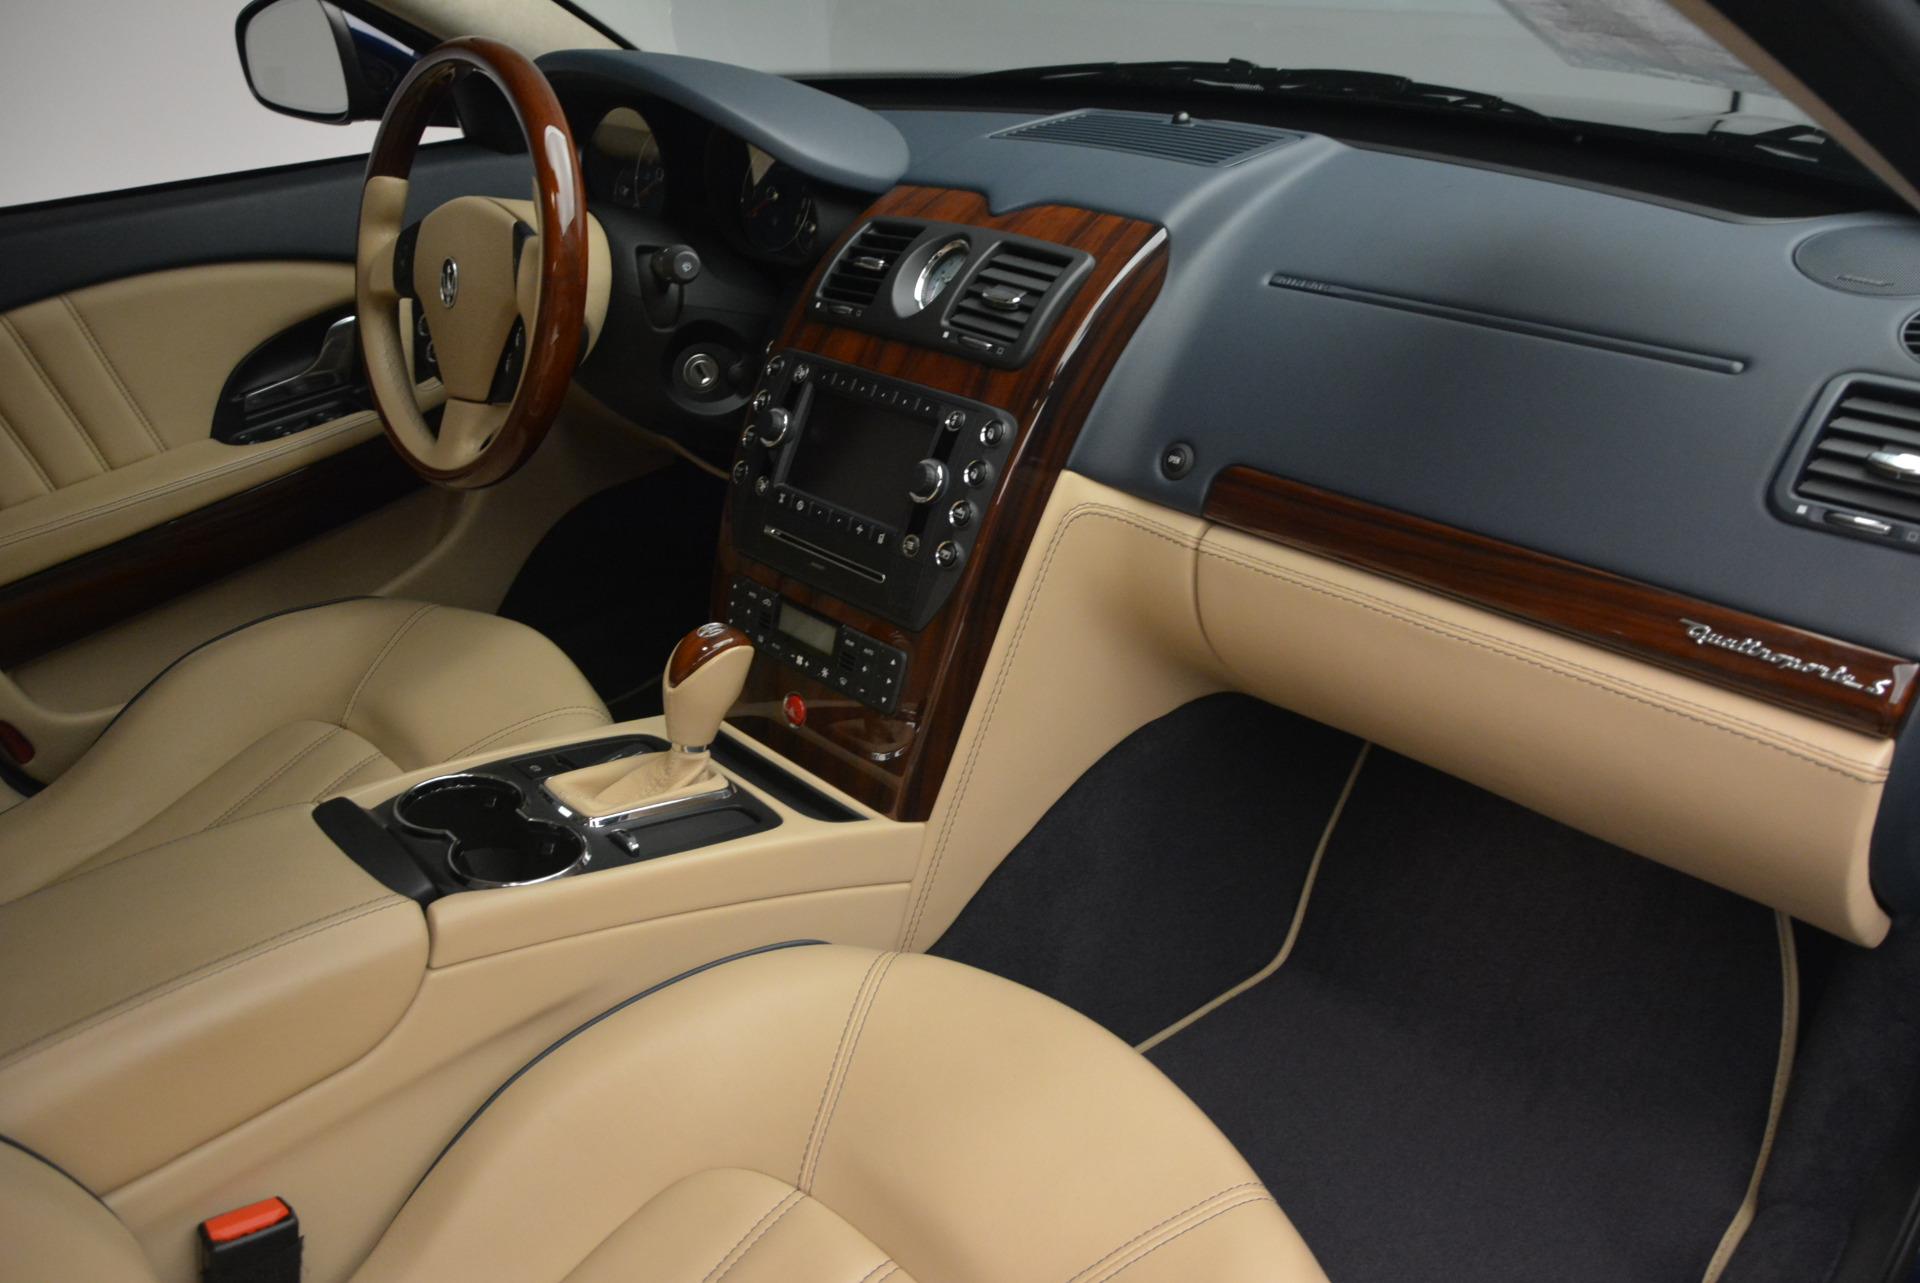 Used 2010 Maserati Quattroporte S For Sale In Westport, CT 795_p19